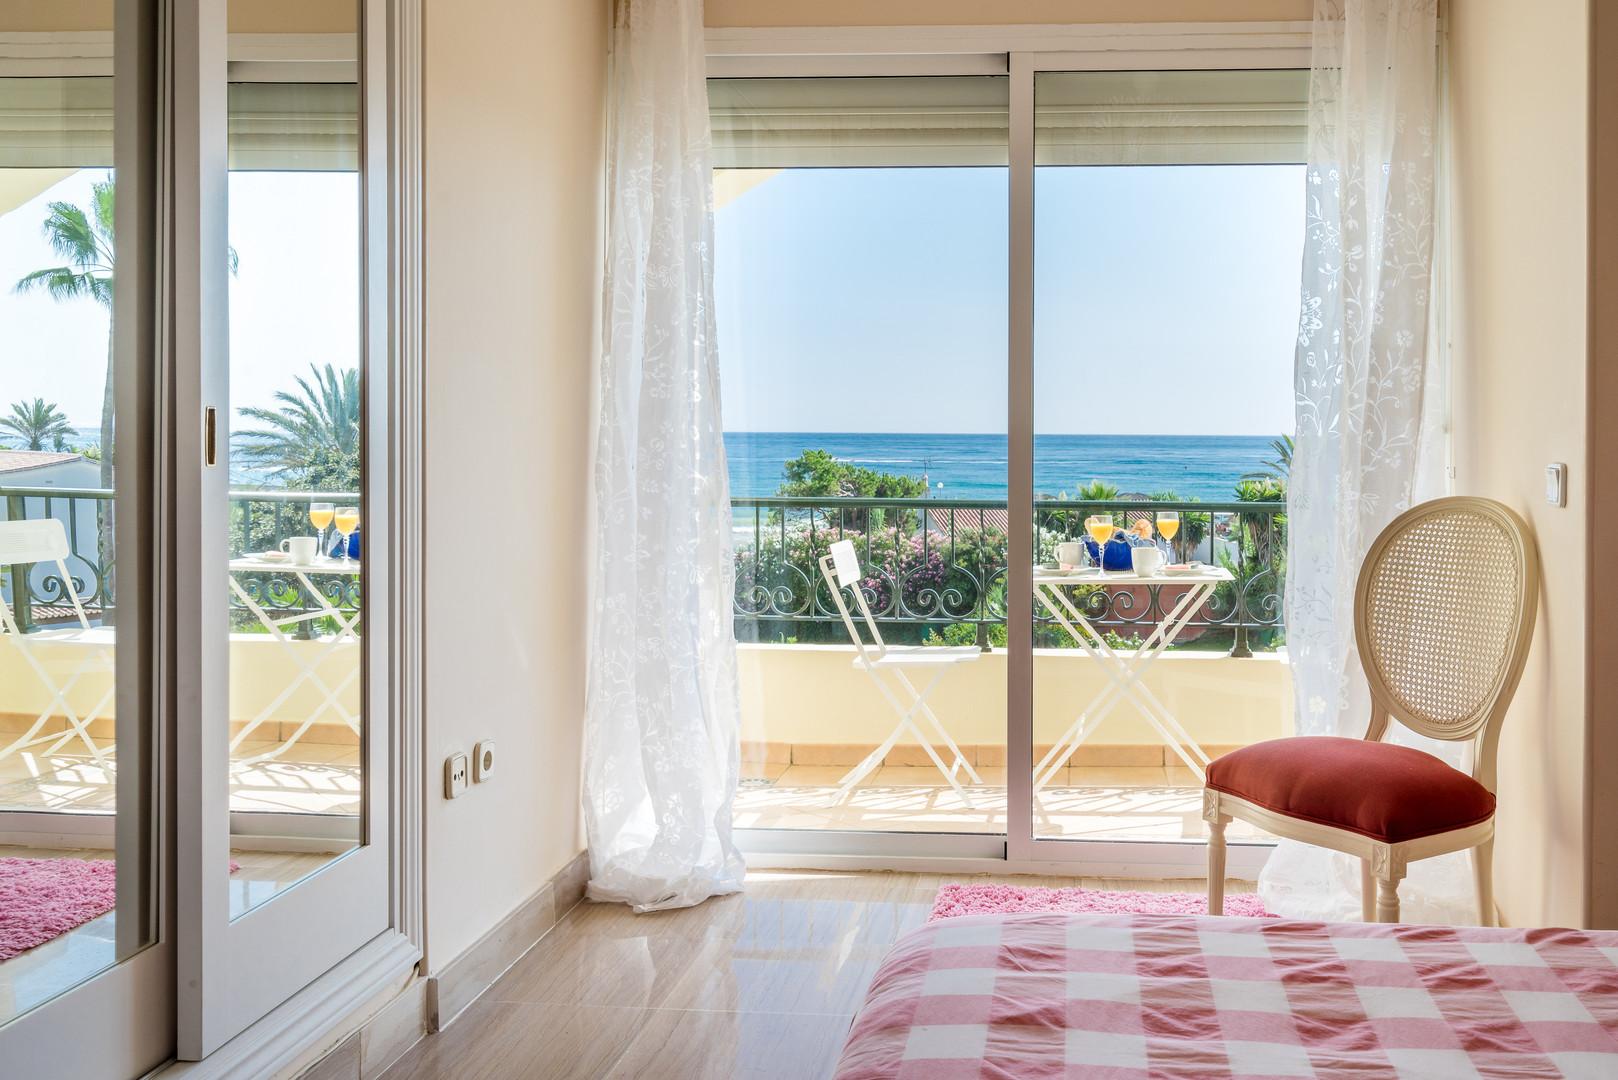 w51 sea view private terrace.jpg